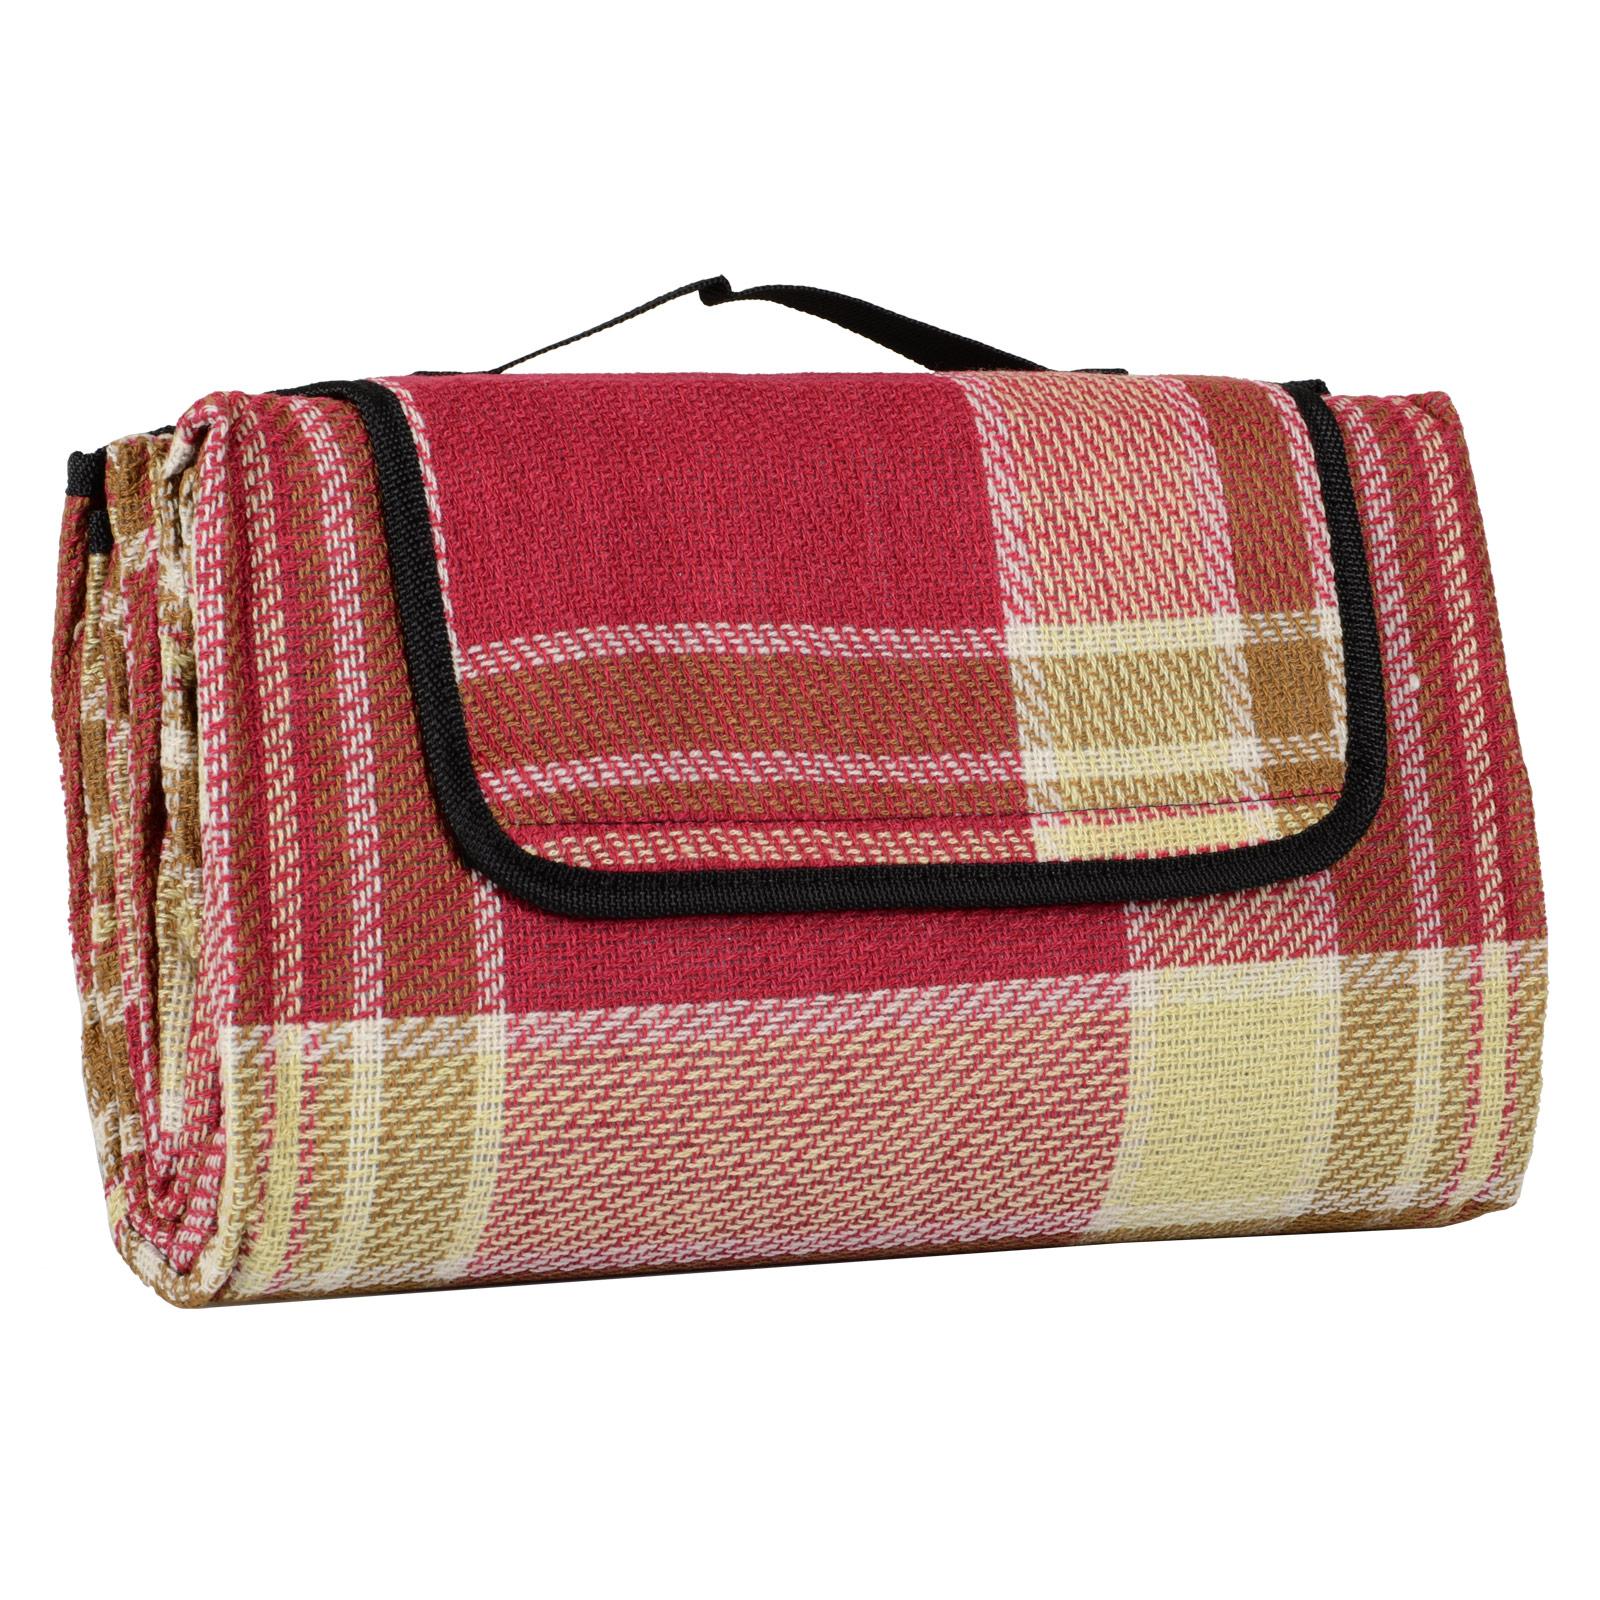 "Large Beach Blankets: New Large 59x51"" Outdoor Waterproof Picnic Blanket Beach"